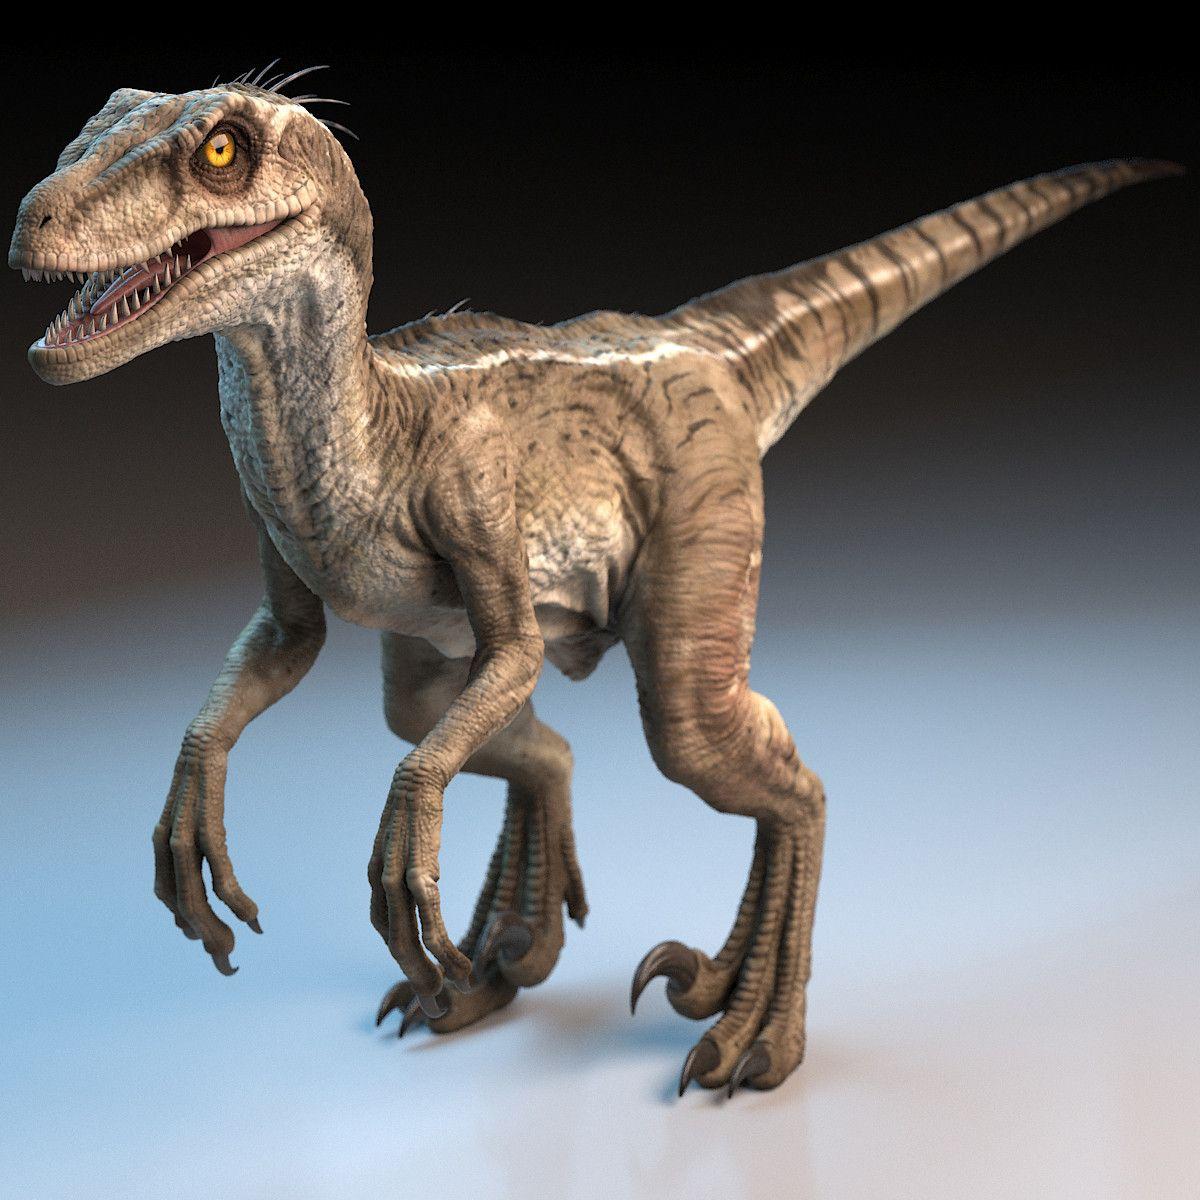 raptor dinosaur 3d model Raptor dinosaur, Dinosaur